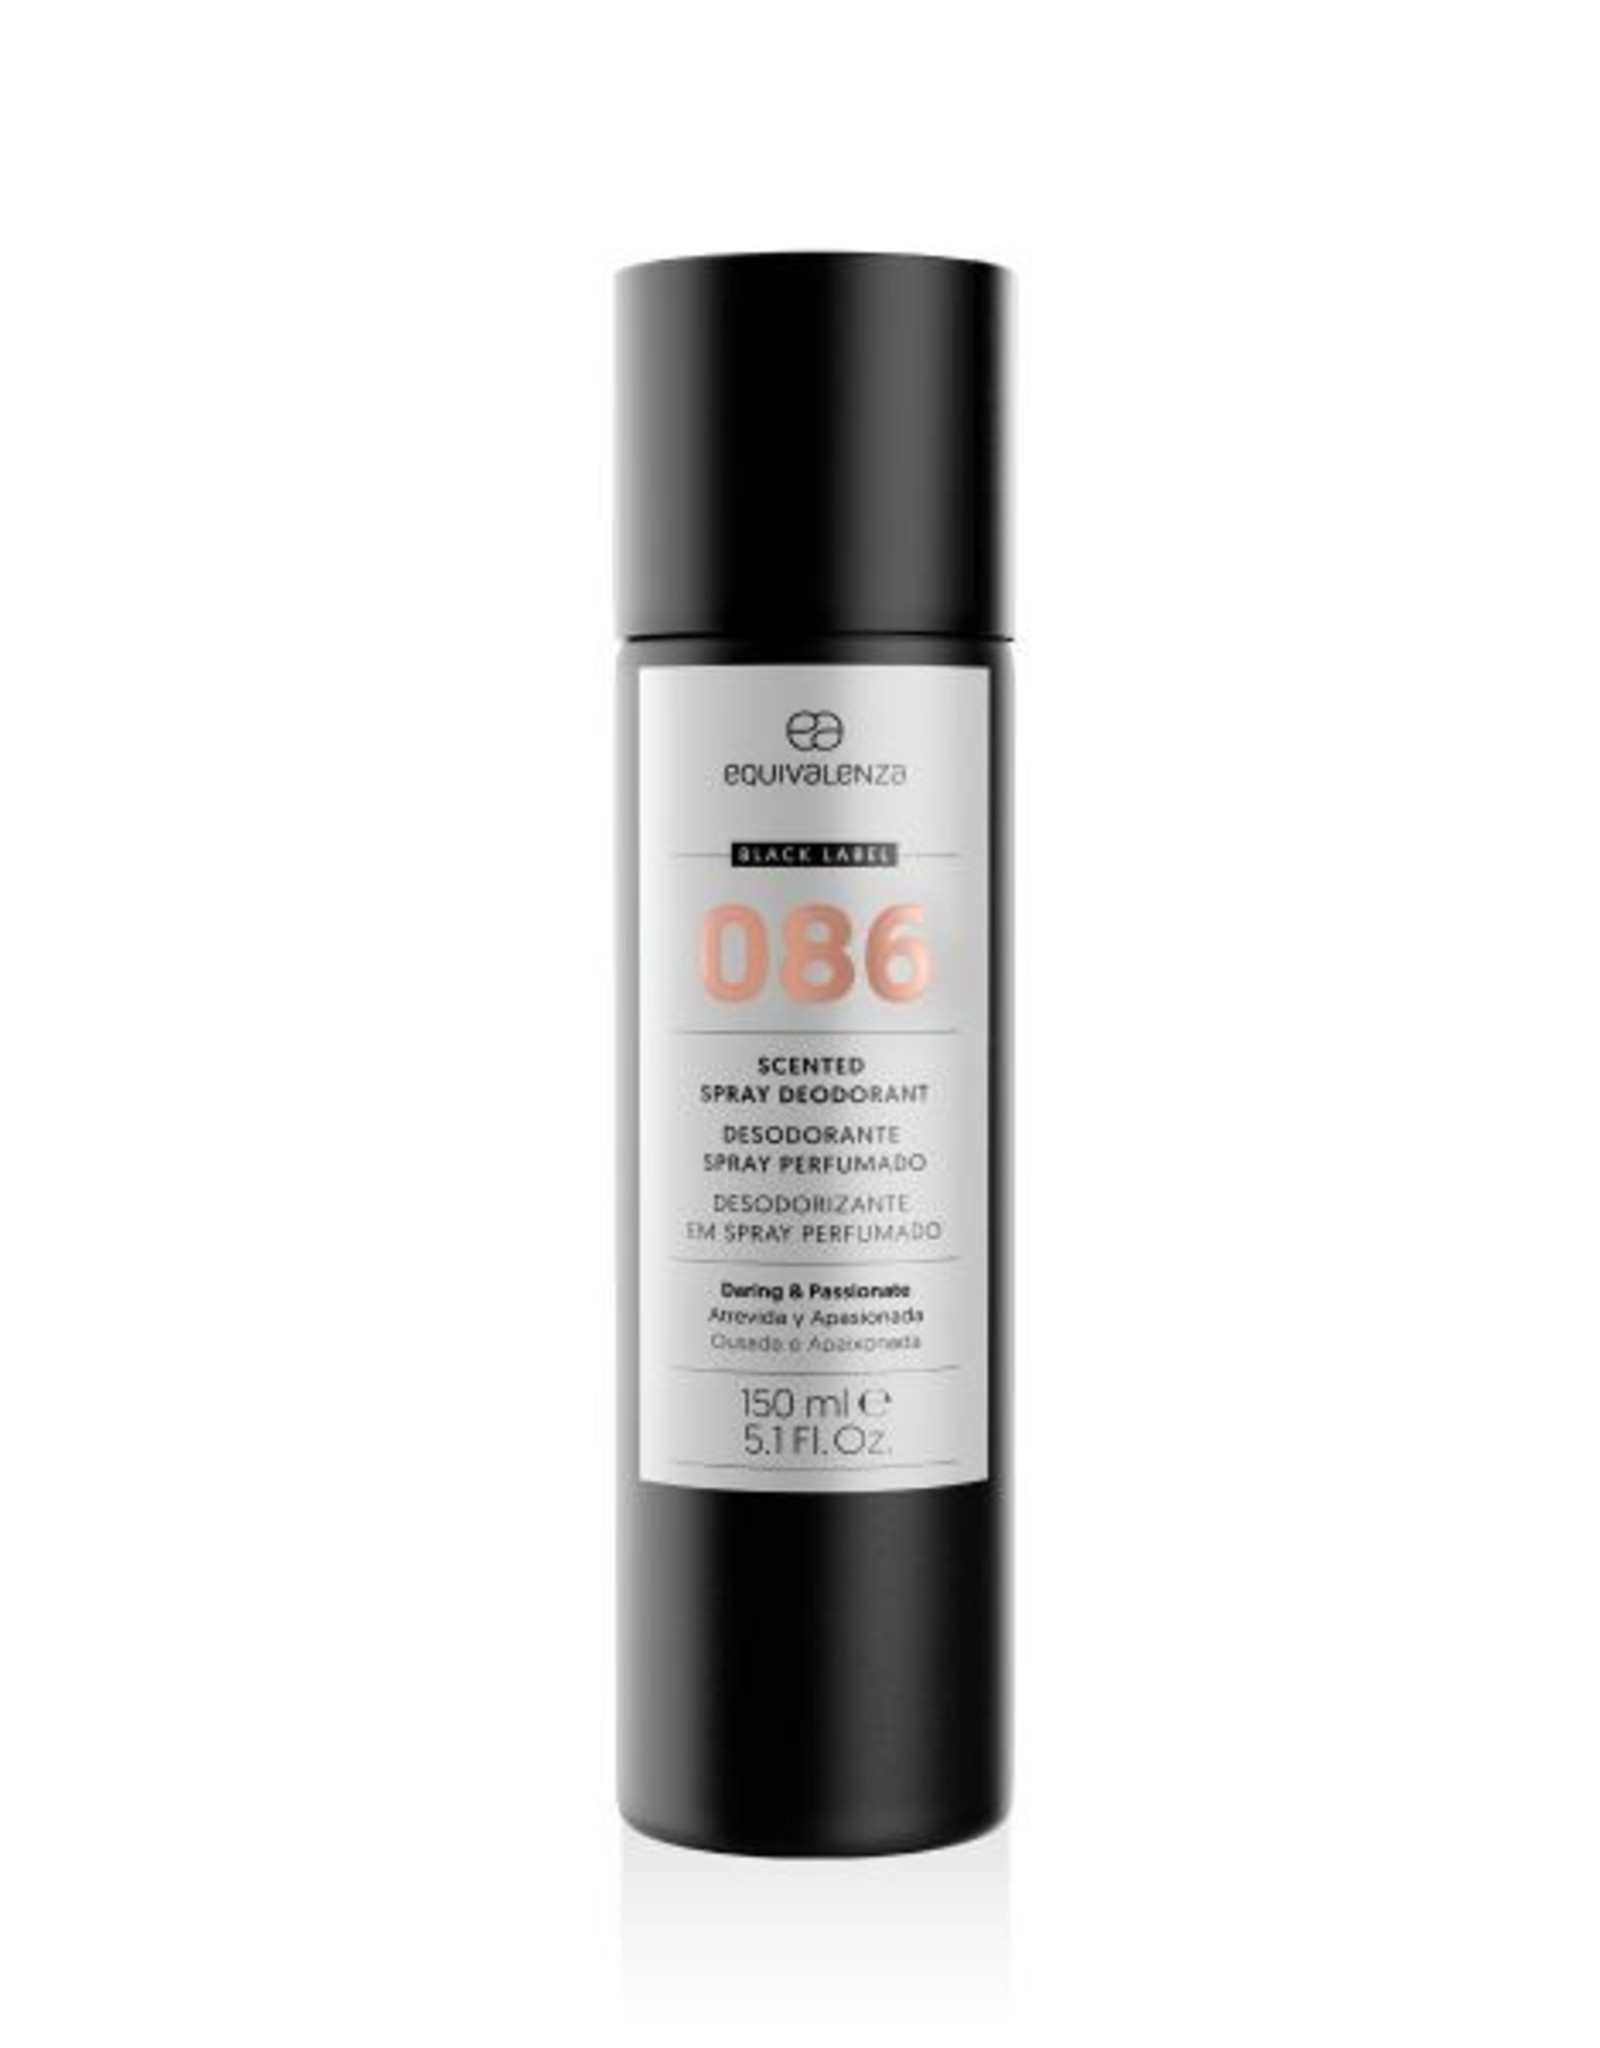 Equivalenza Déodorant Black Label 086